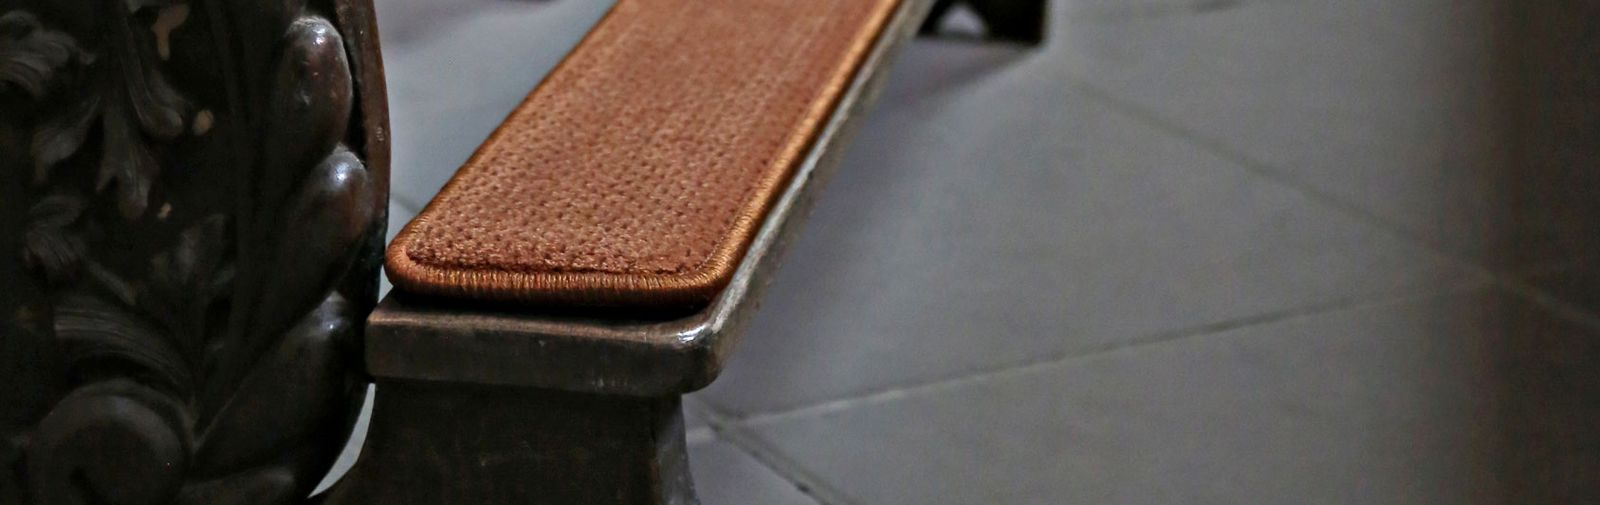 Kneeling bench hassock crushed velvet